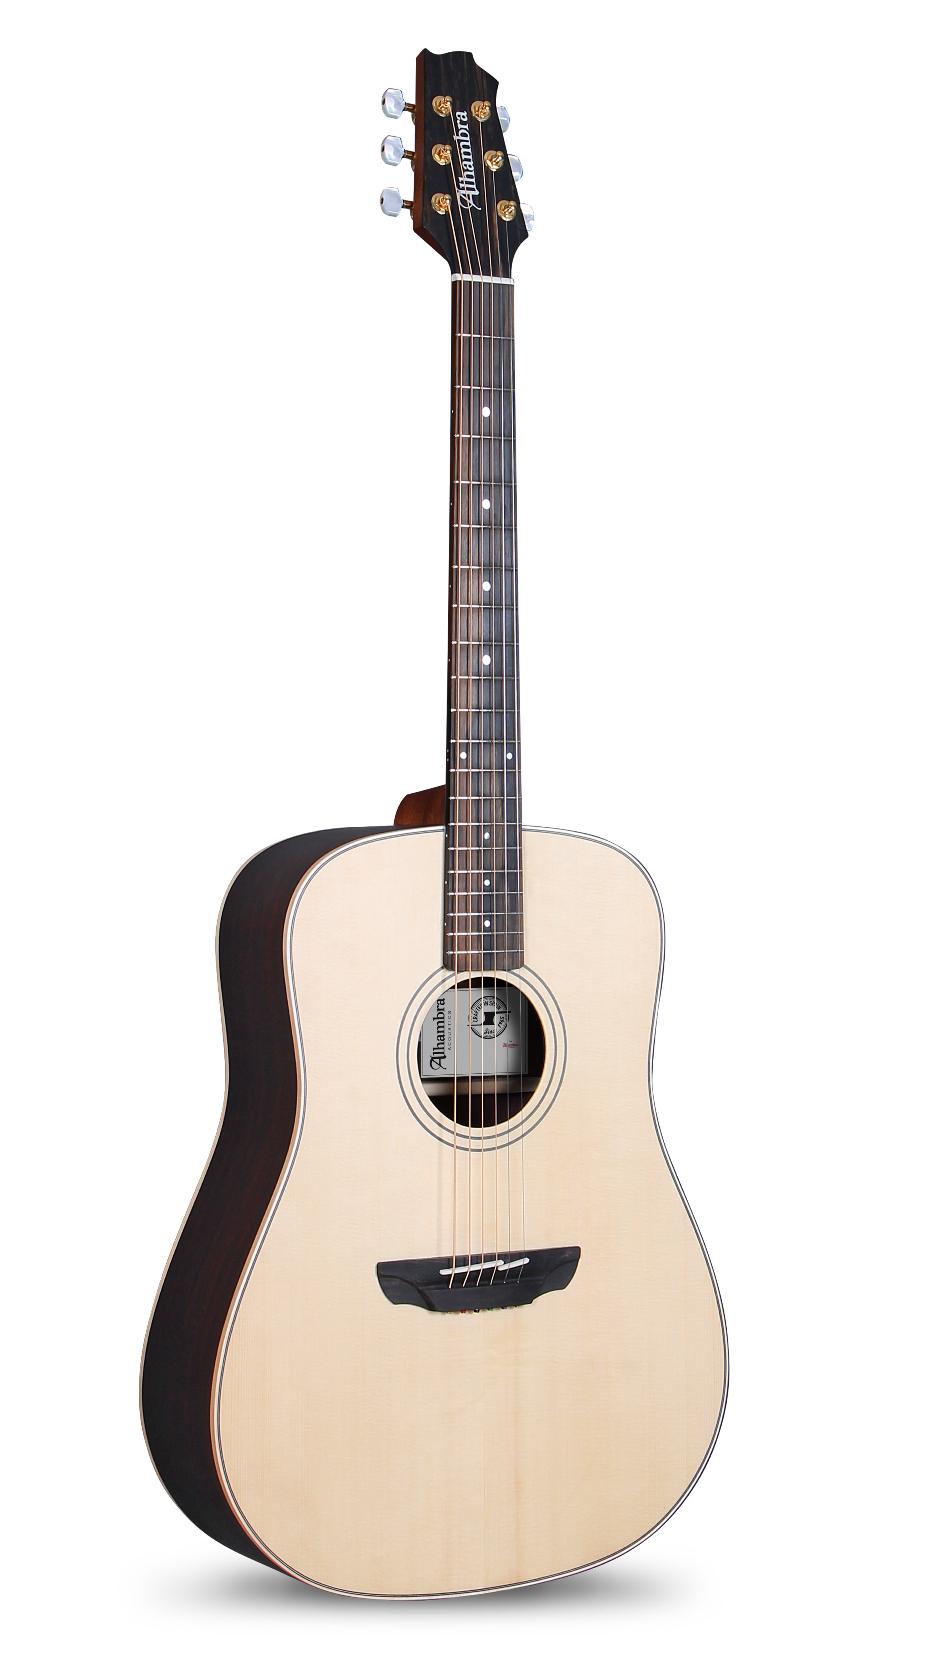 Guitarras Alhambra Acoustic Guitars